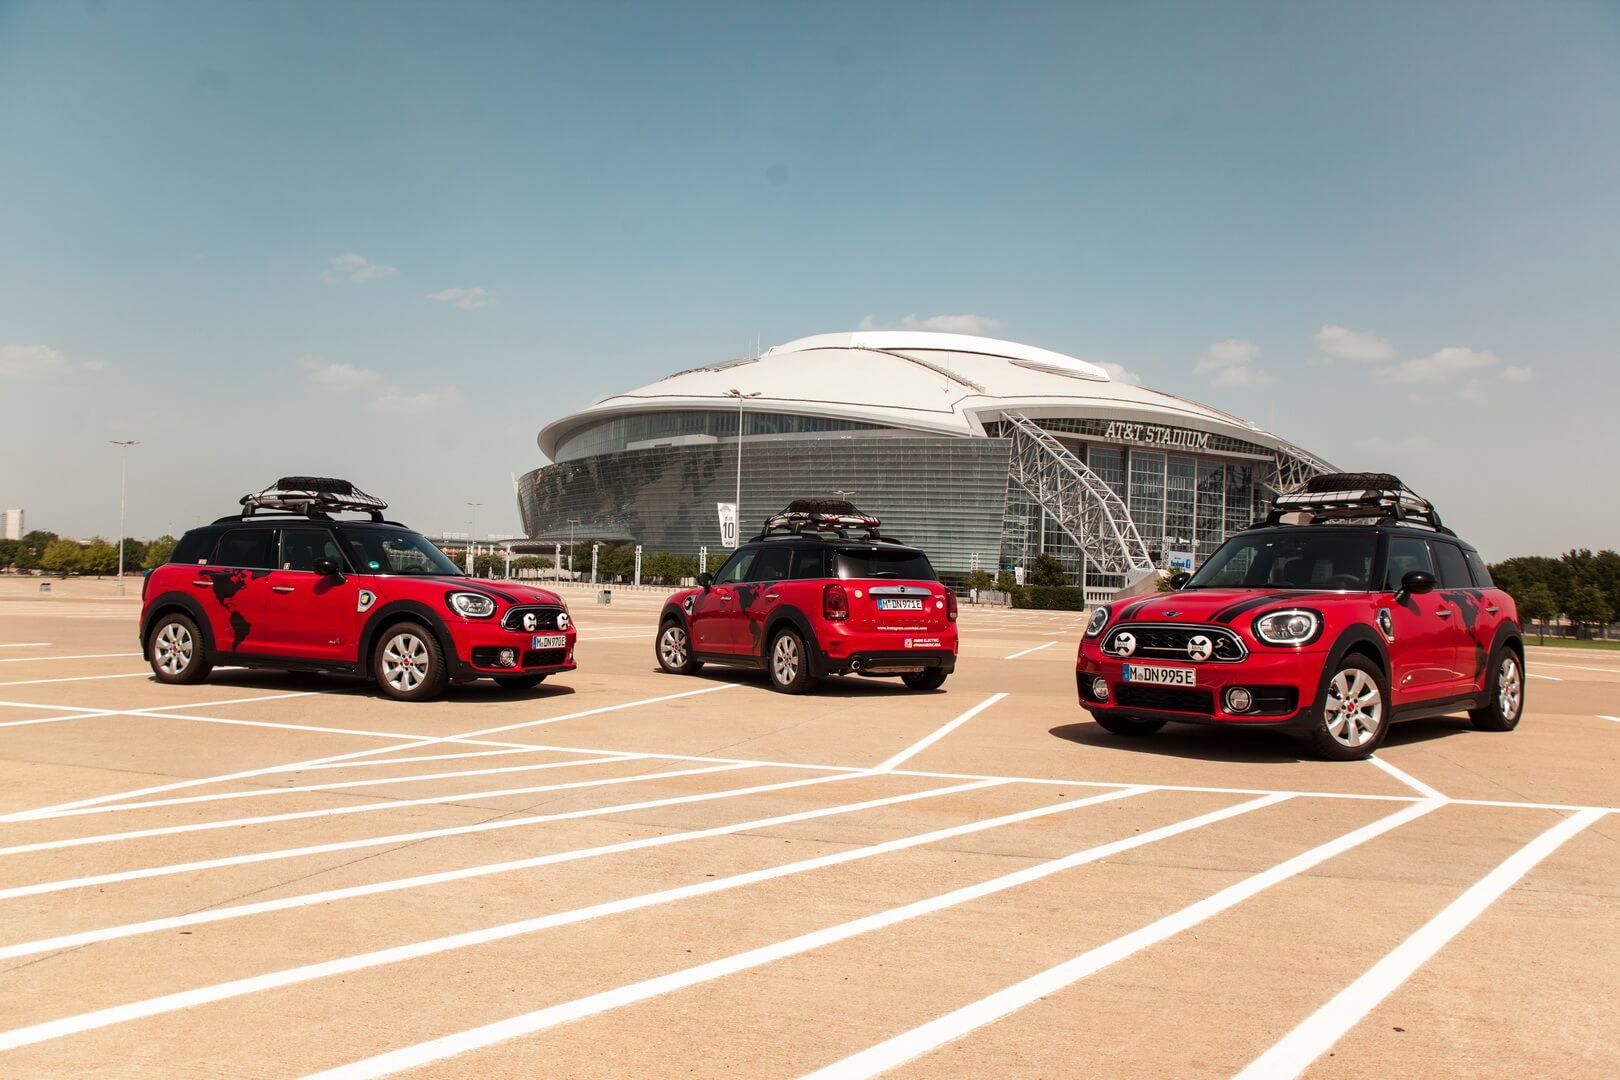 Три плагин-гибридные модели Mini Cooper SECountryman ALL4 отправились втур Panamericana